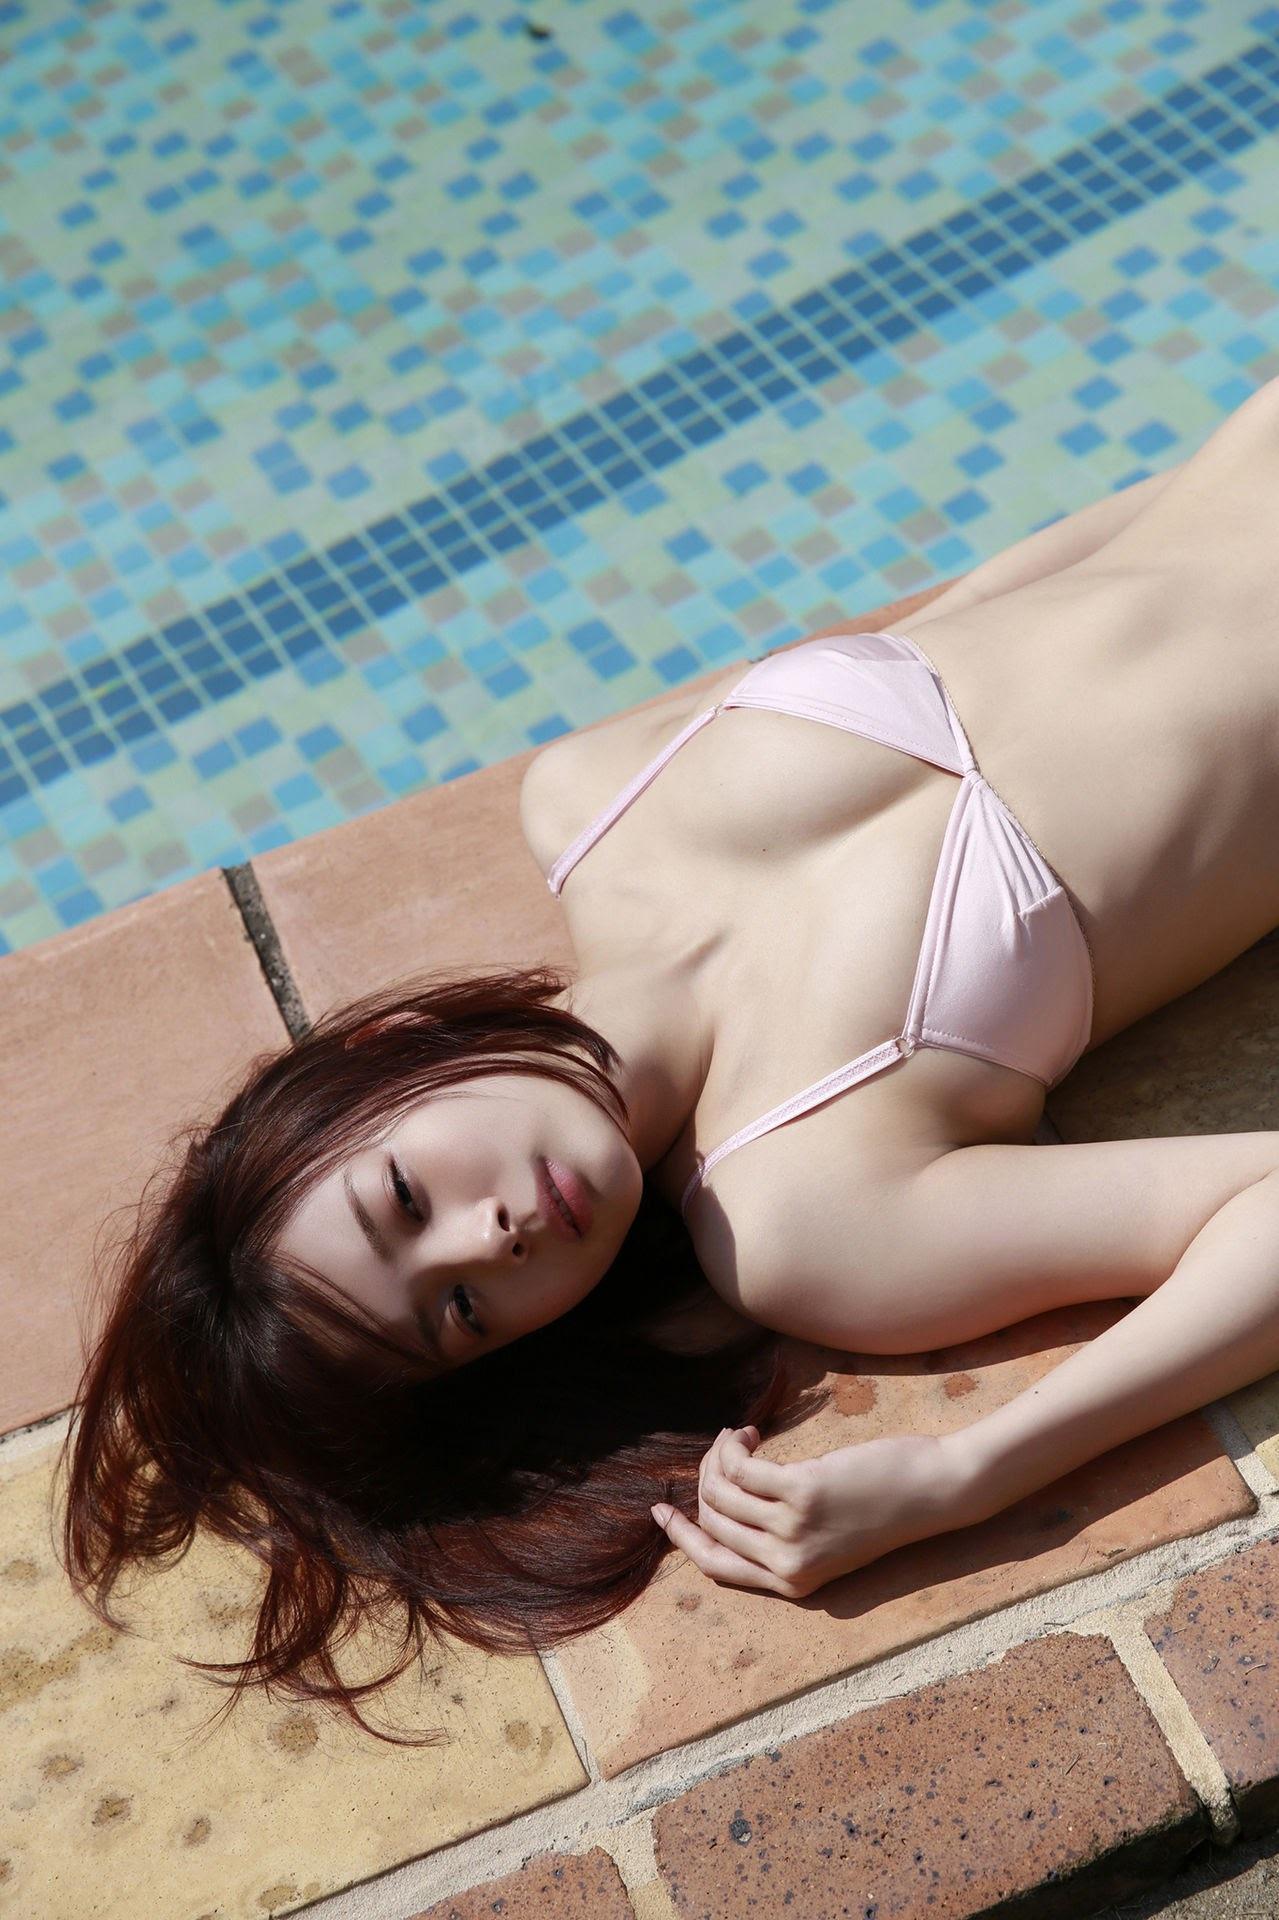 23 years old Shaka Okada, who is also a professional mahjong player010